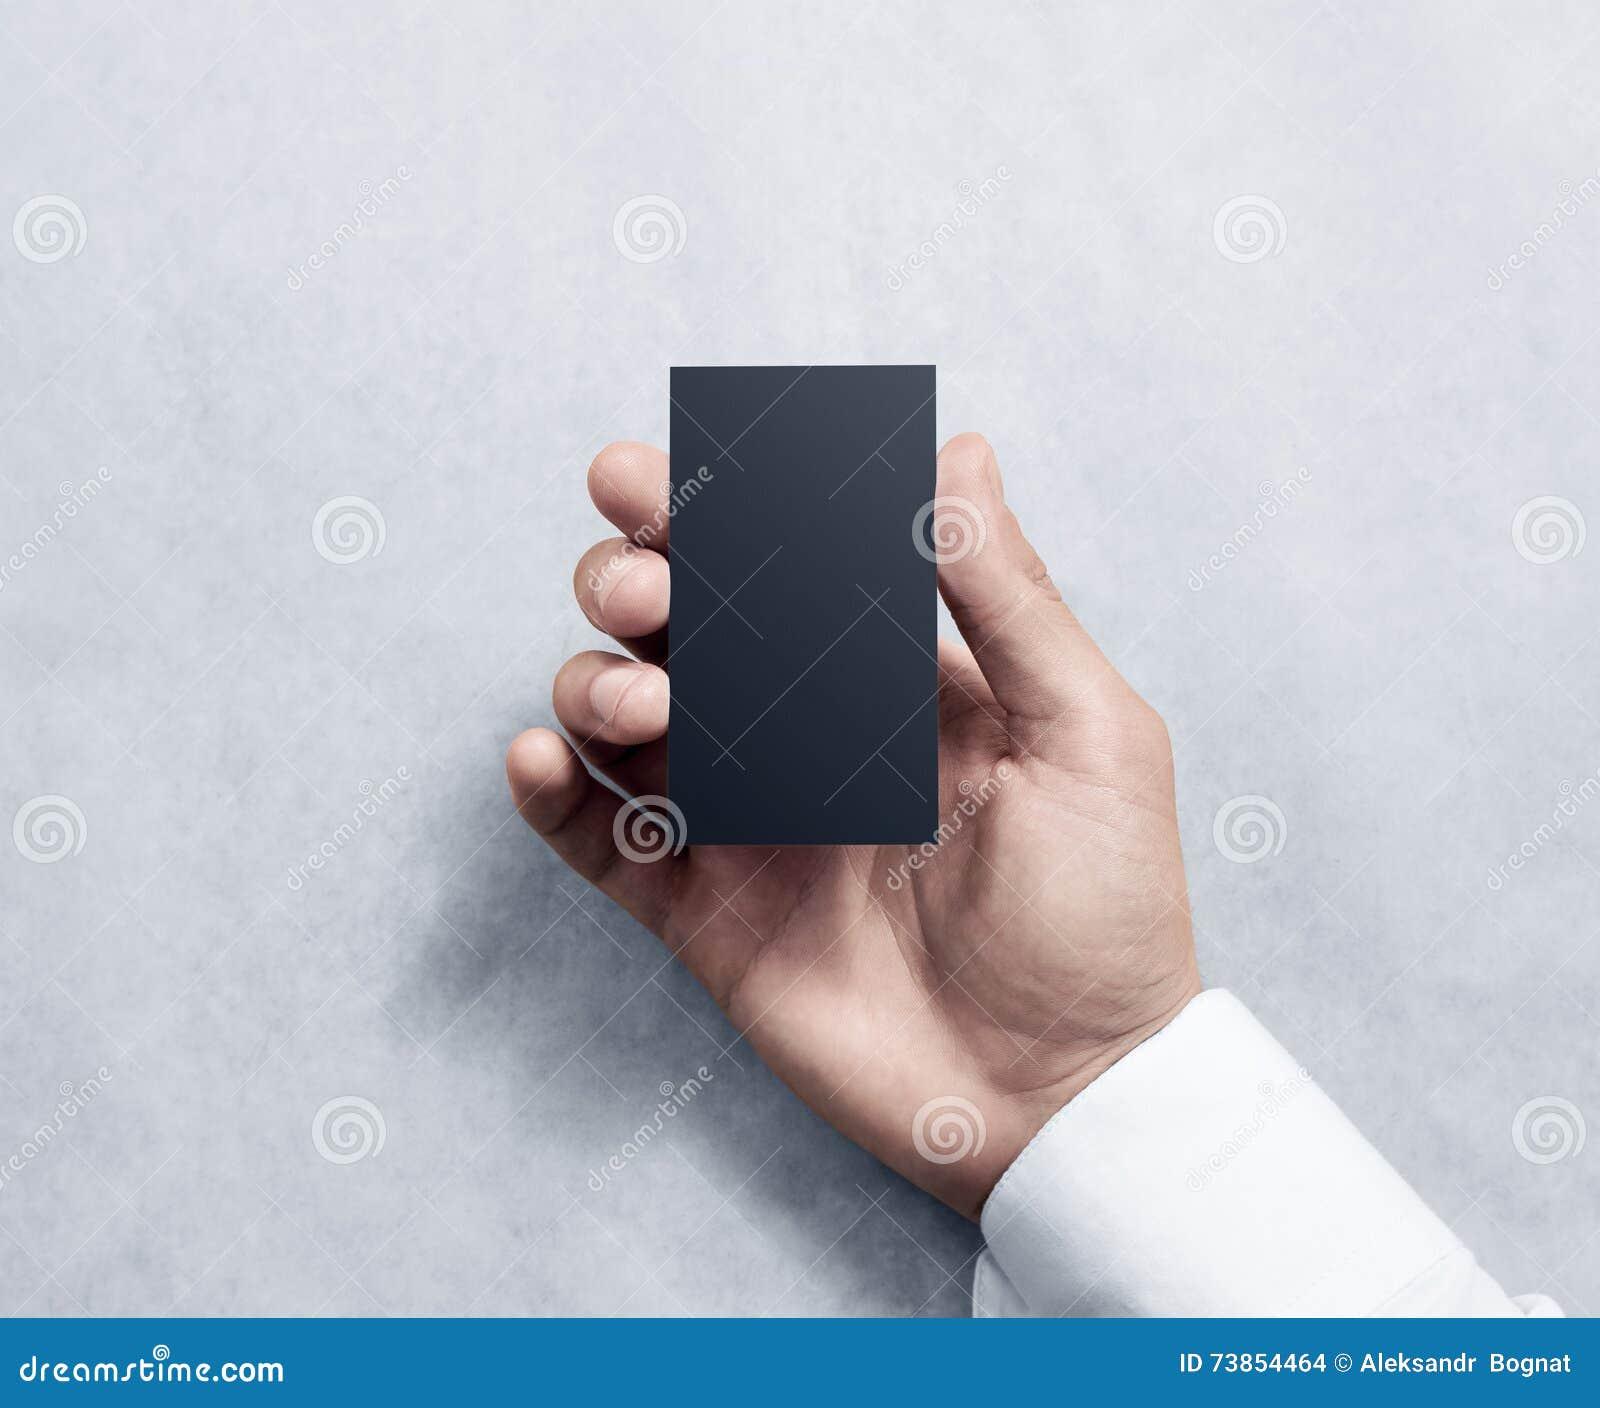 Hand Holding Blank Vertical Black Business Card Design Mockup Stock